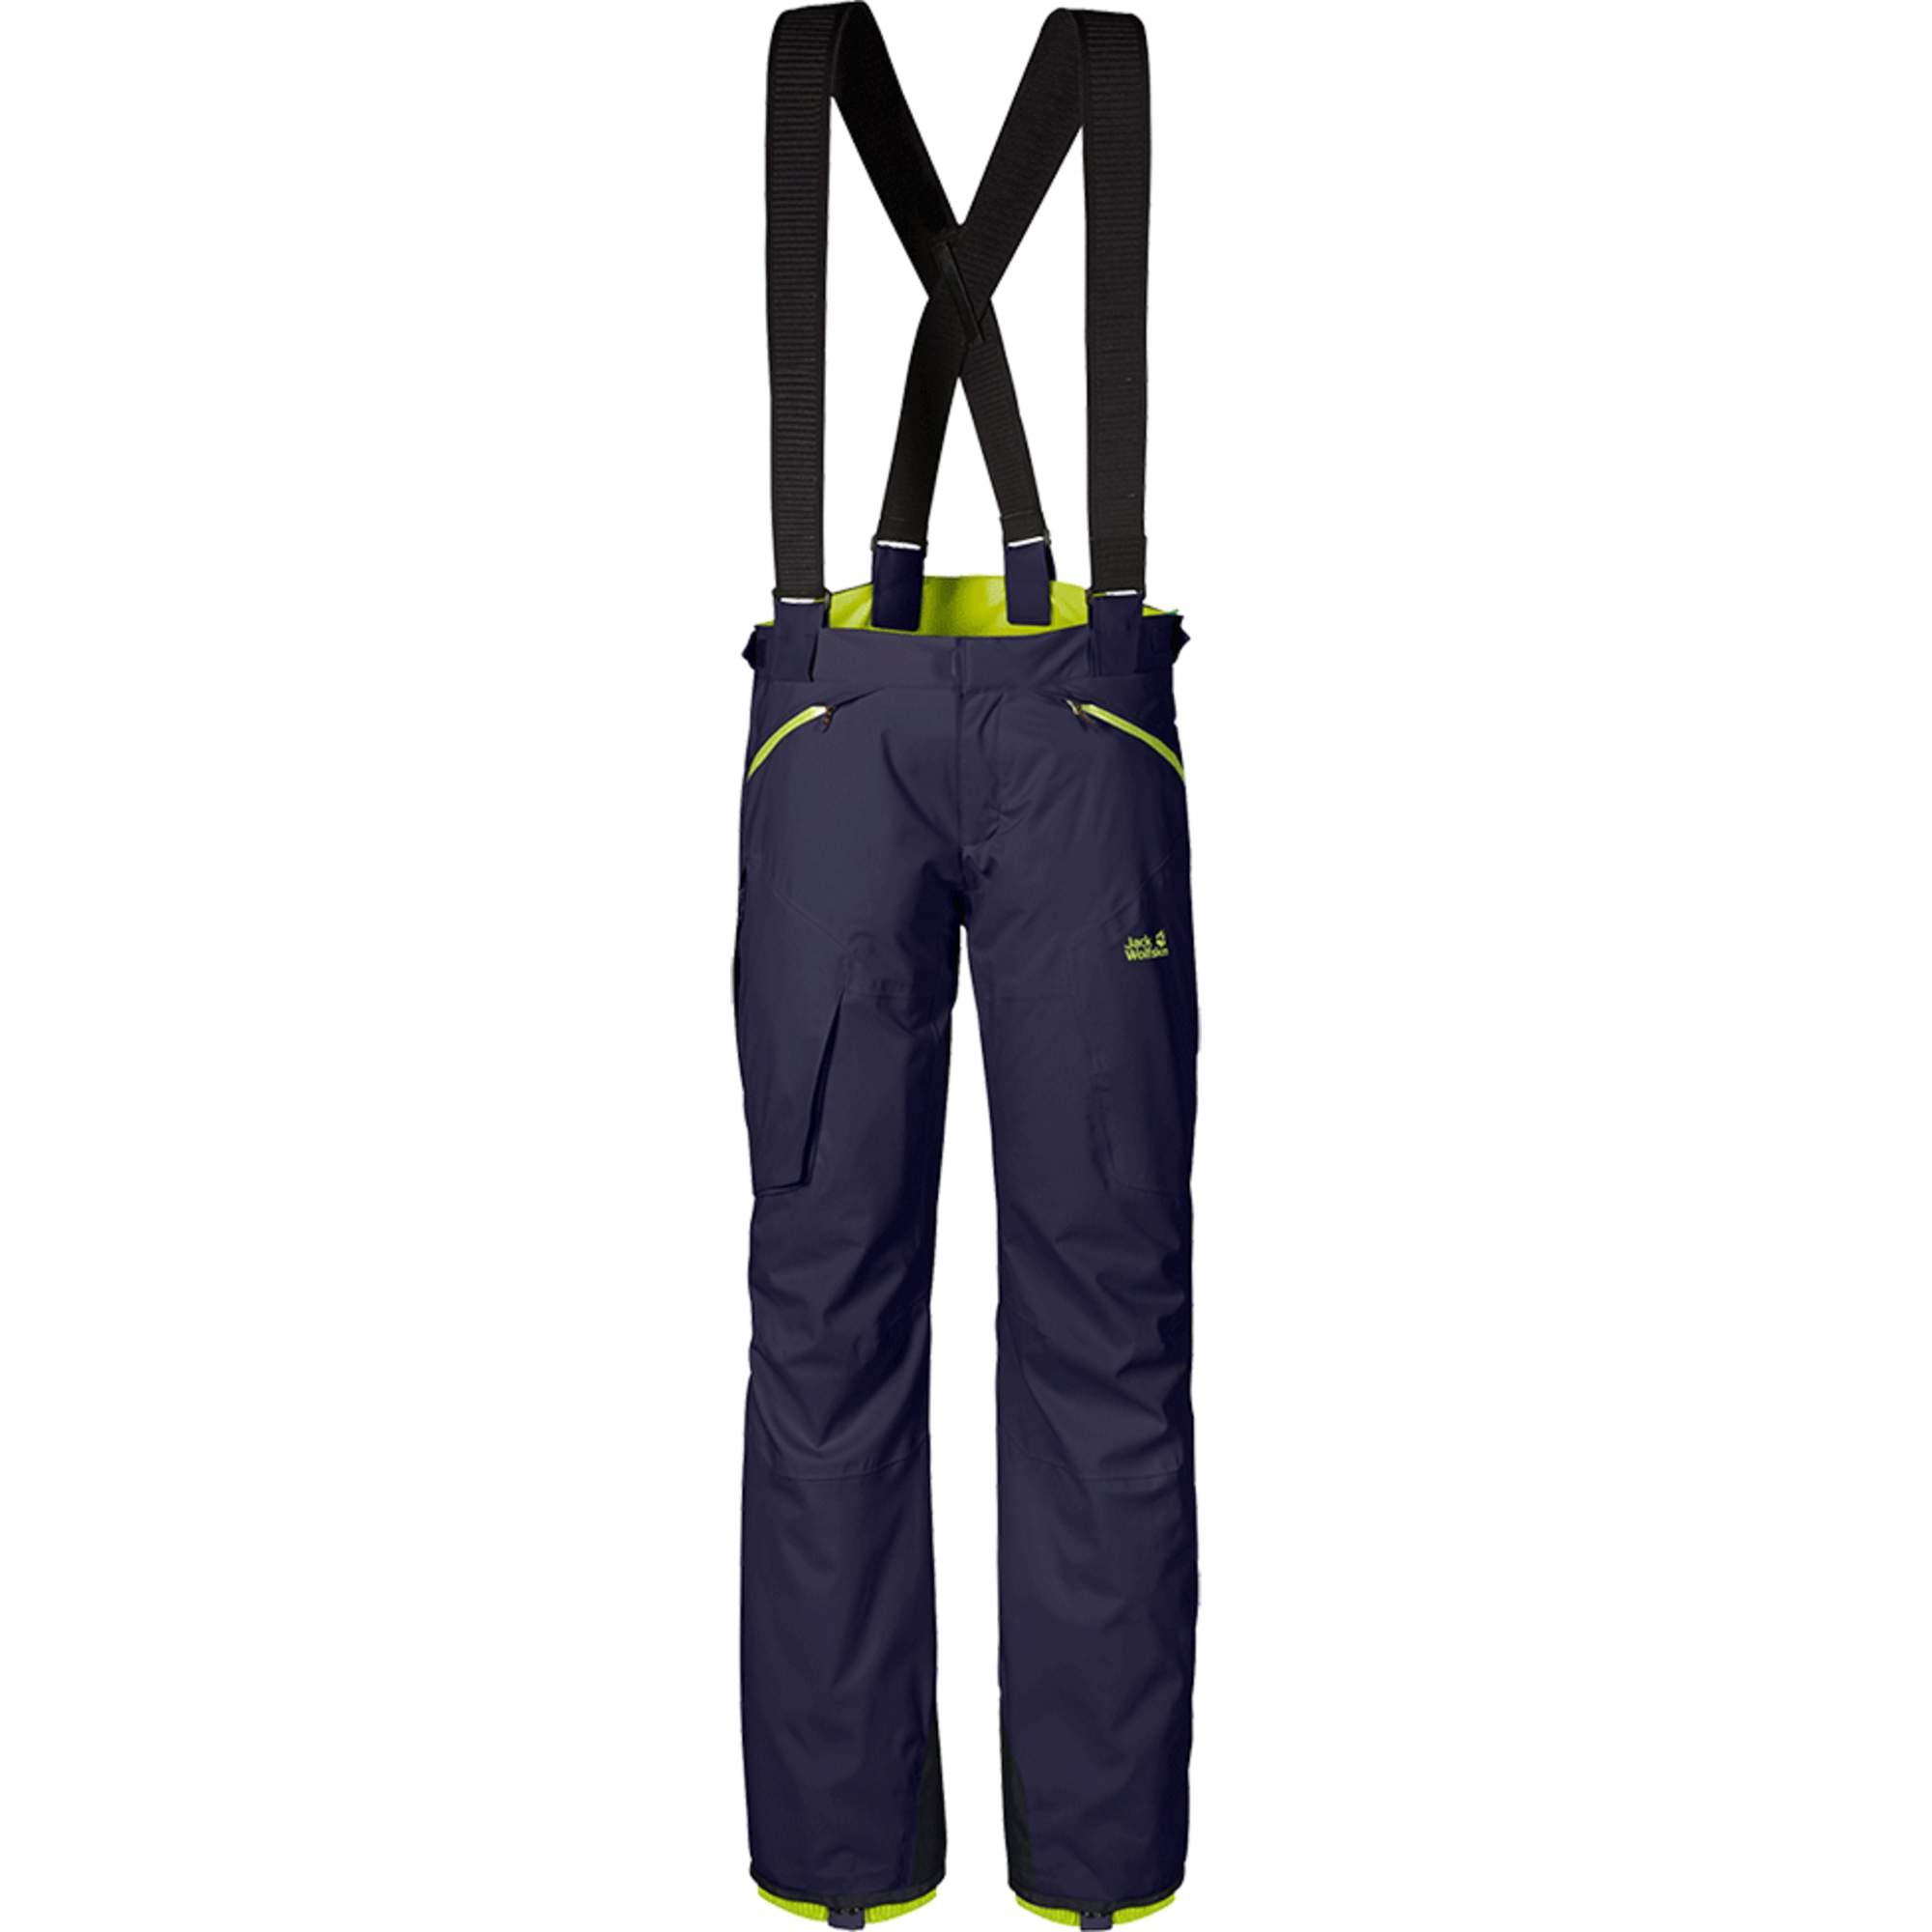 Jack Wolfskin ReveL/Stoke Texapore II Pants Männer Gr. 58 - Skihose - blau